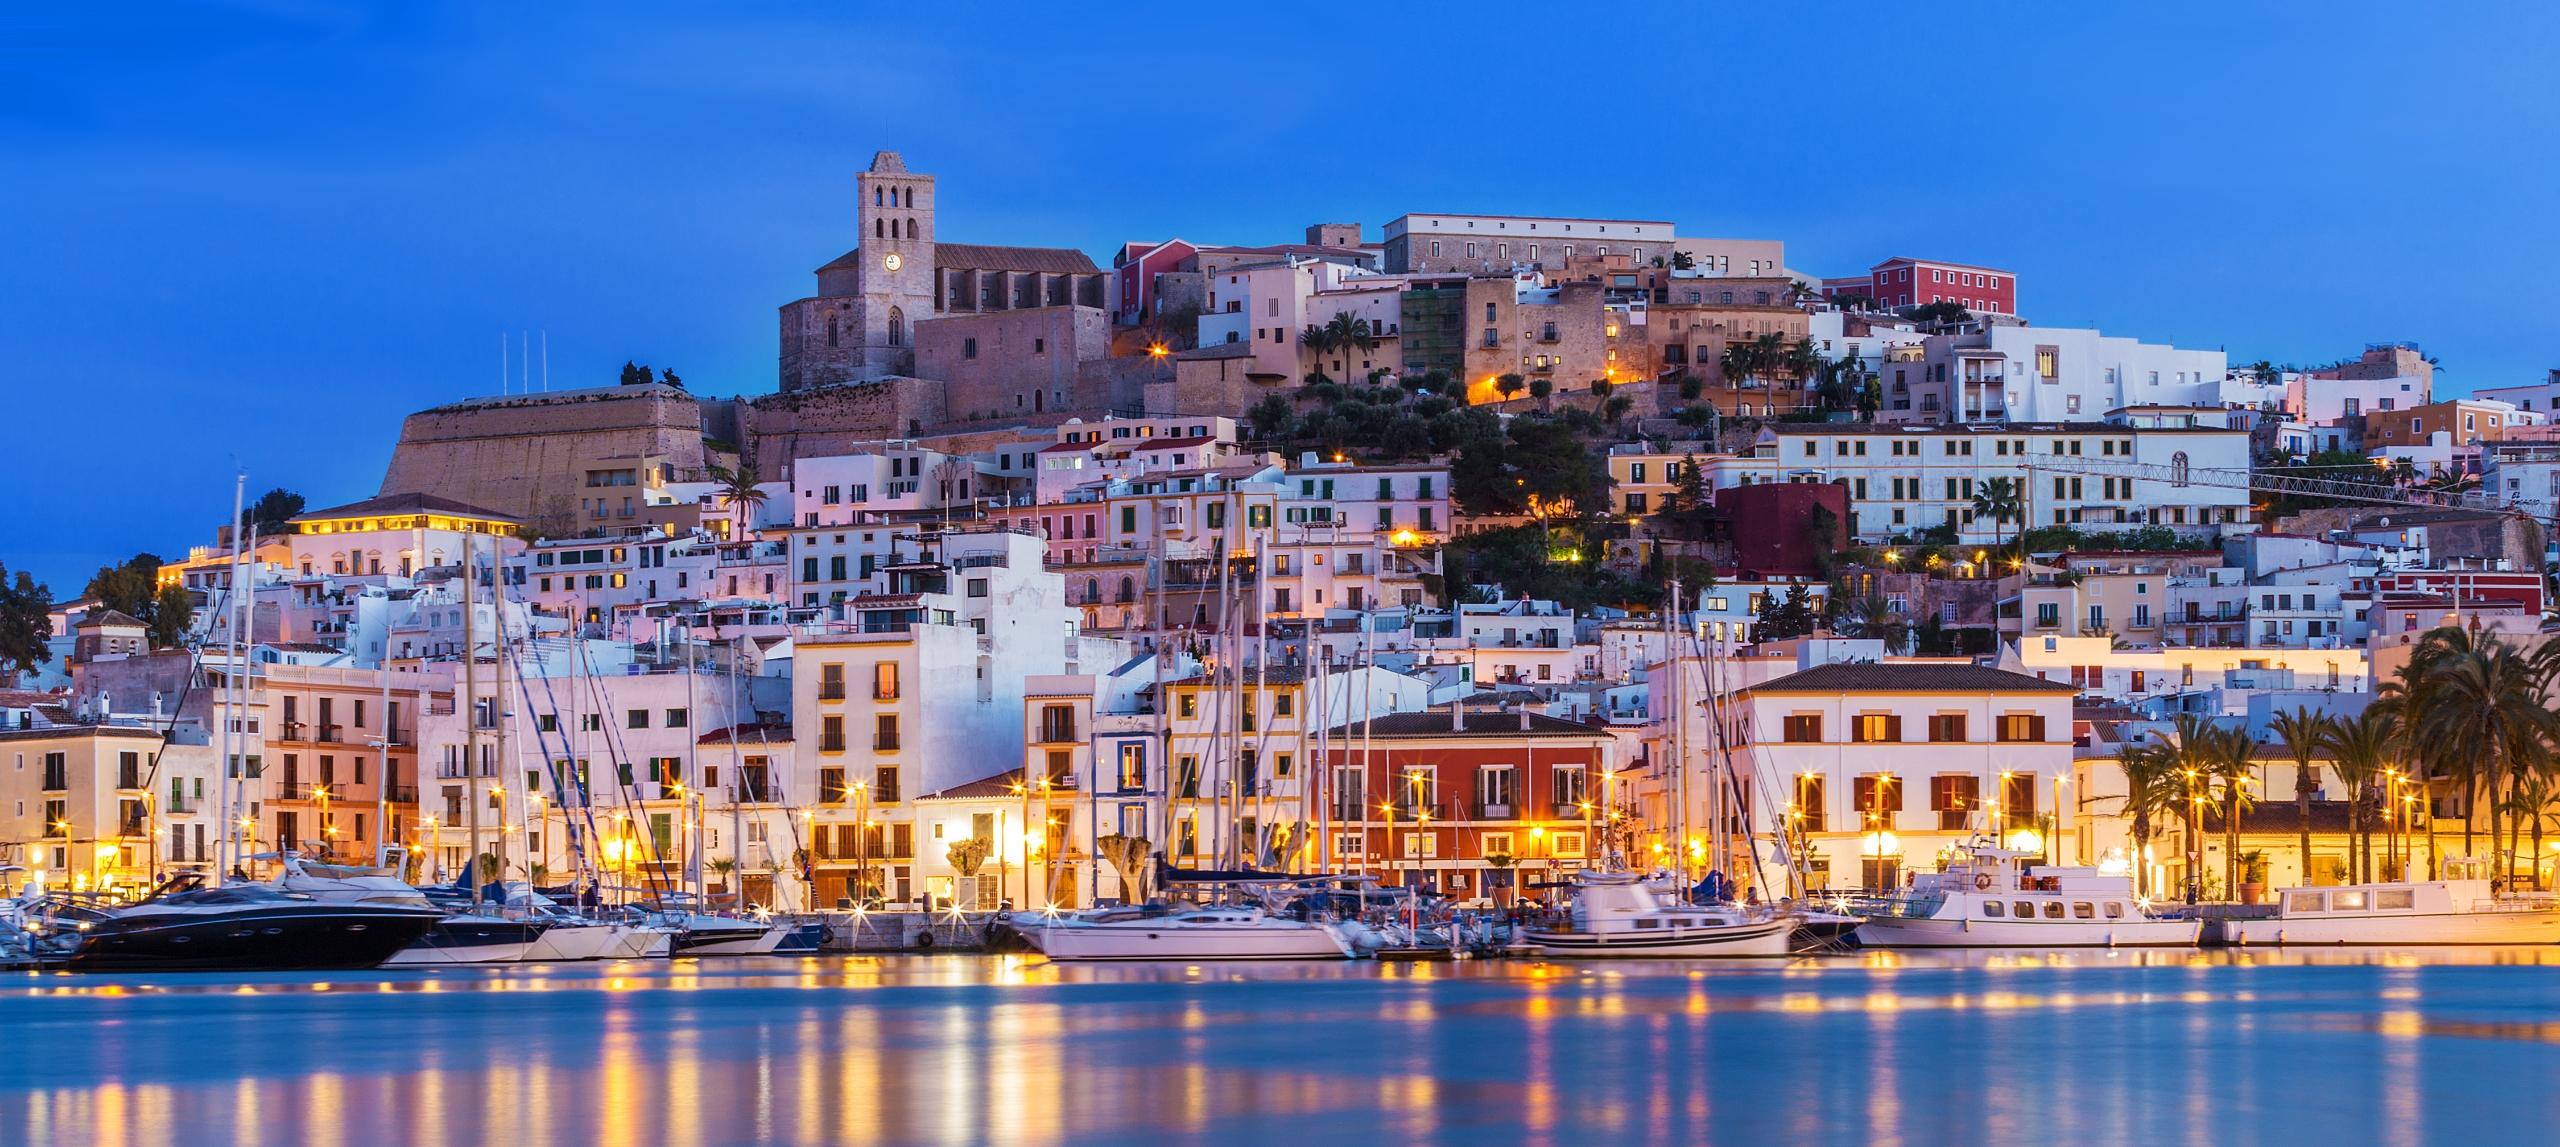 Moonscape H20 | Ibiza Nightlife (@ibizanightlife) Cover Image